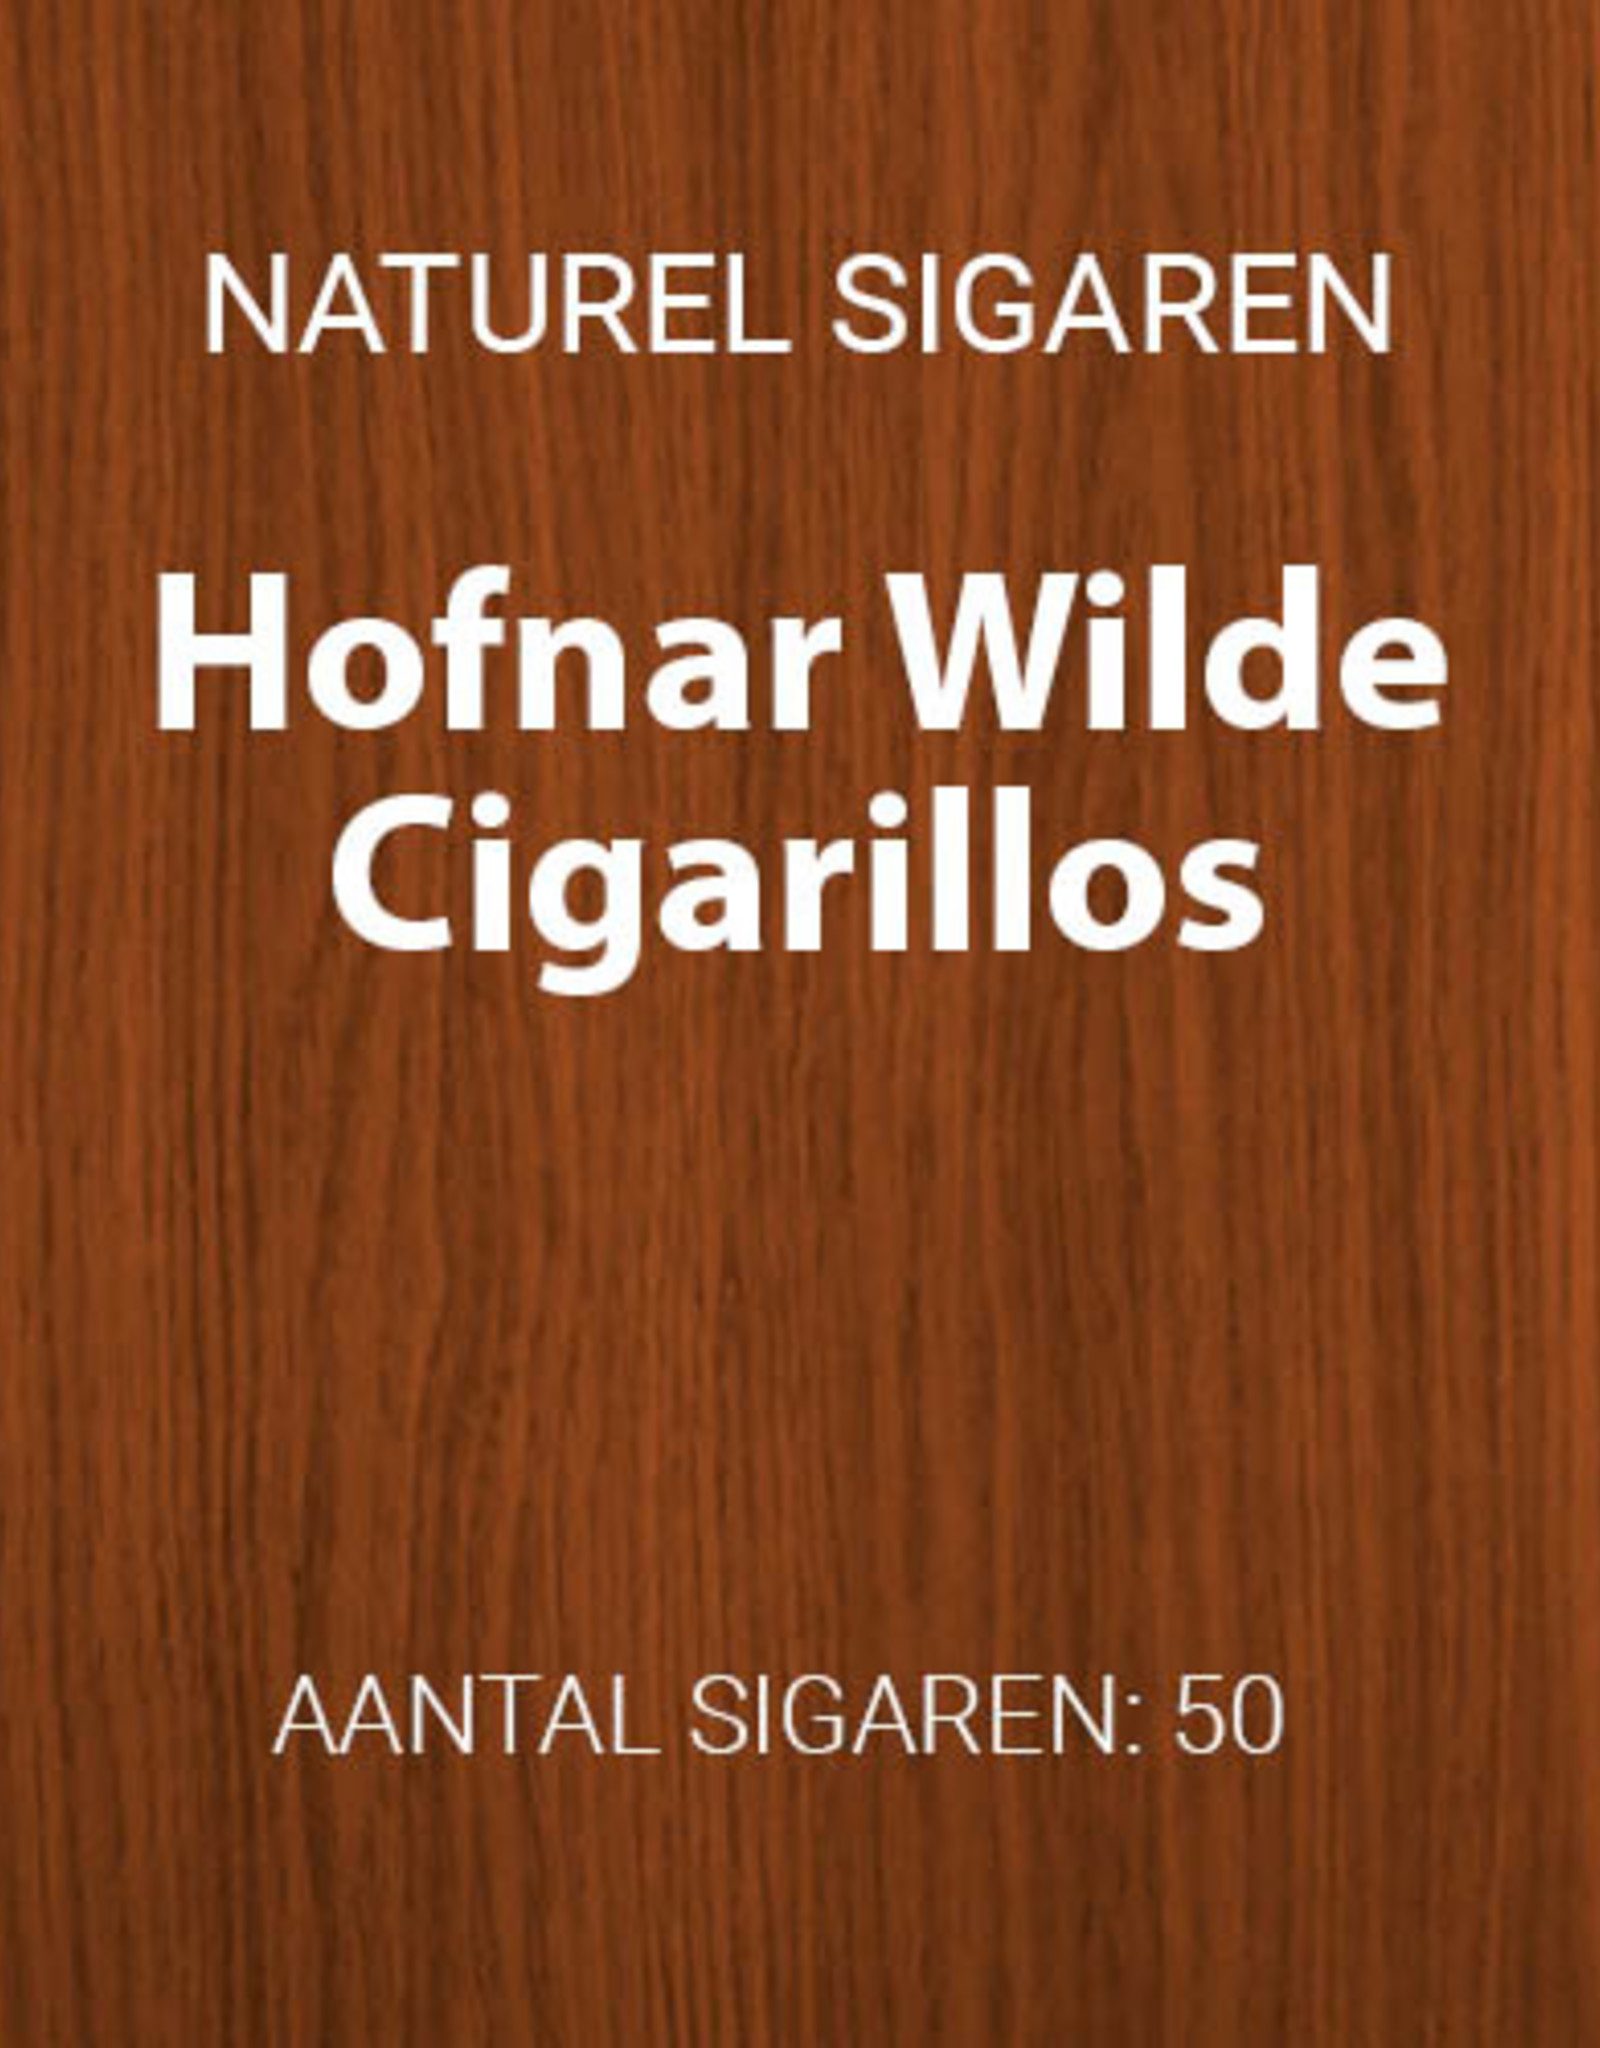 Hofnar Wilde Cigarillos